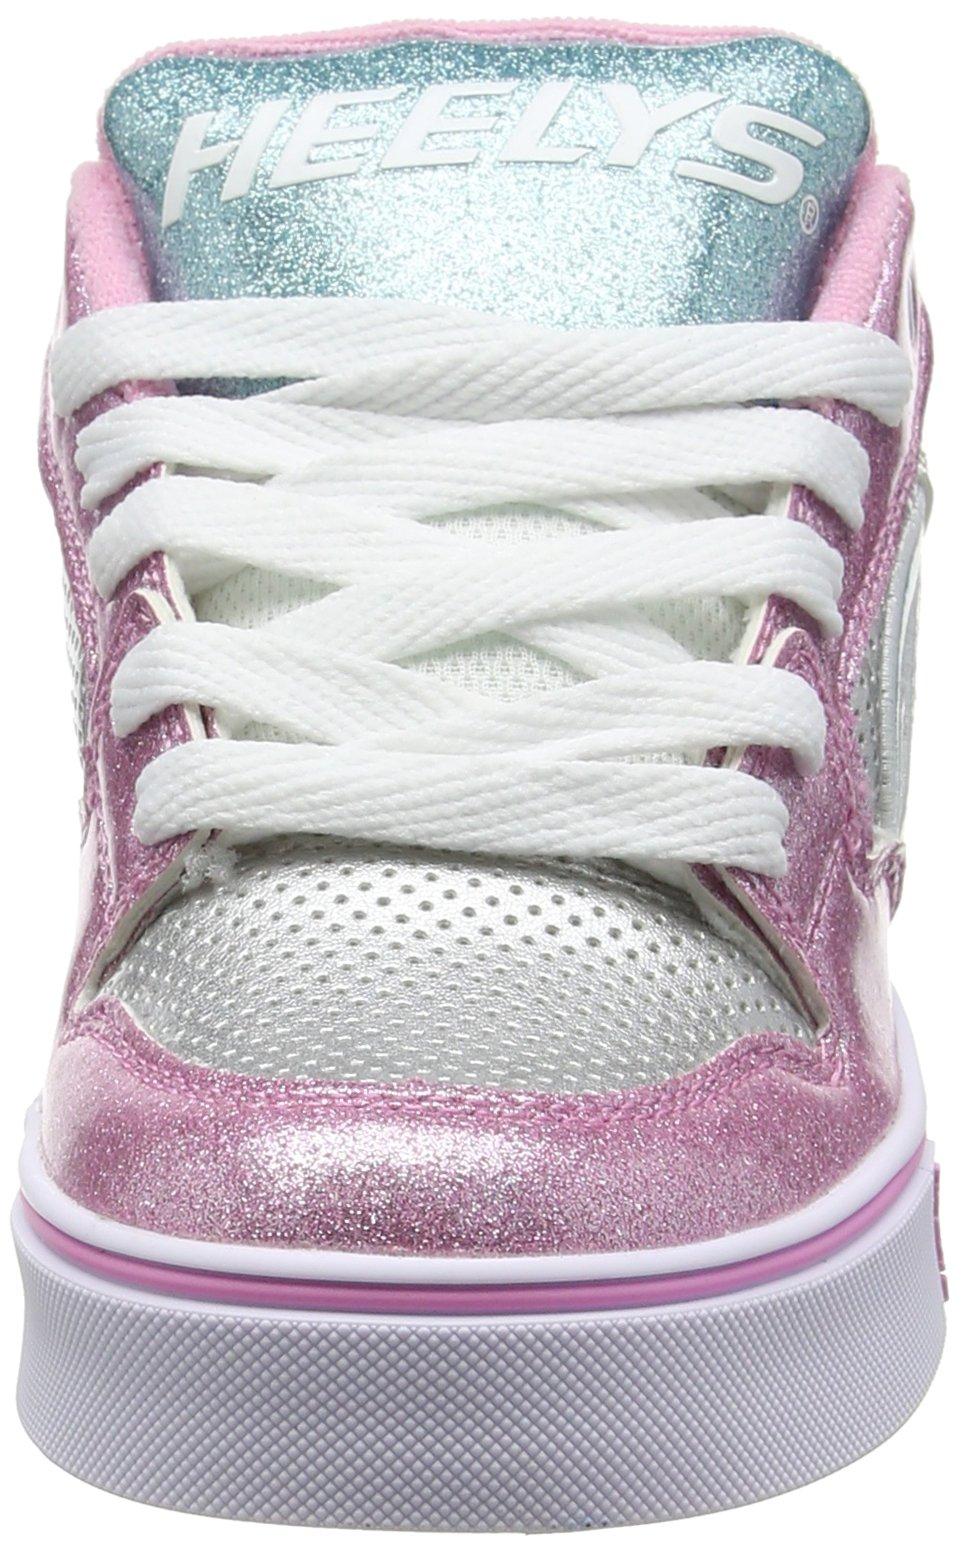 Heelys Girl's Motion Plus (Little Kid/Big Kid/Adult) Silver/Pink/Blue/Glitter Shoe by Heelys (Image #4)